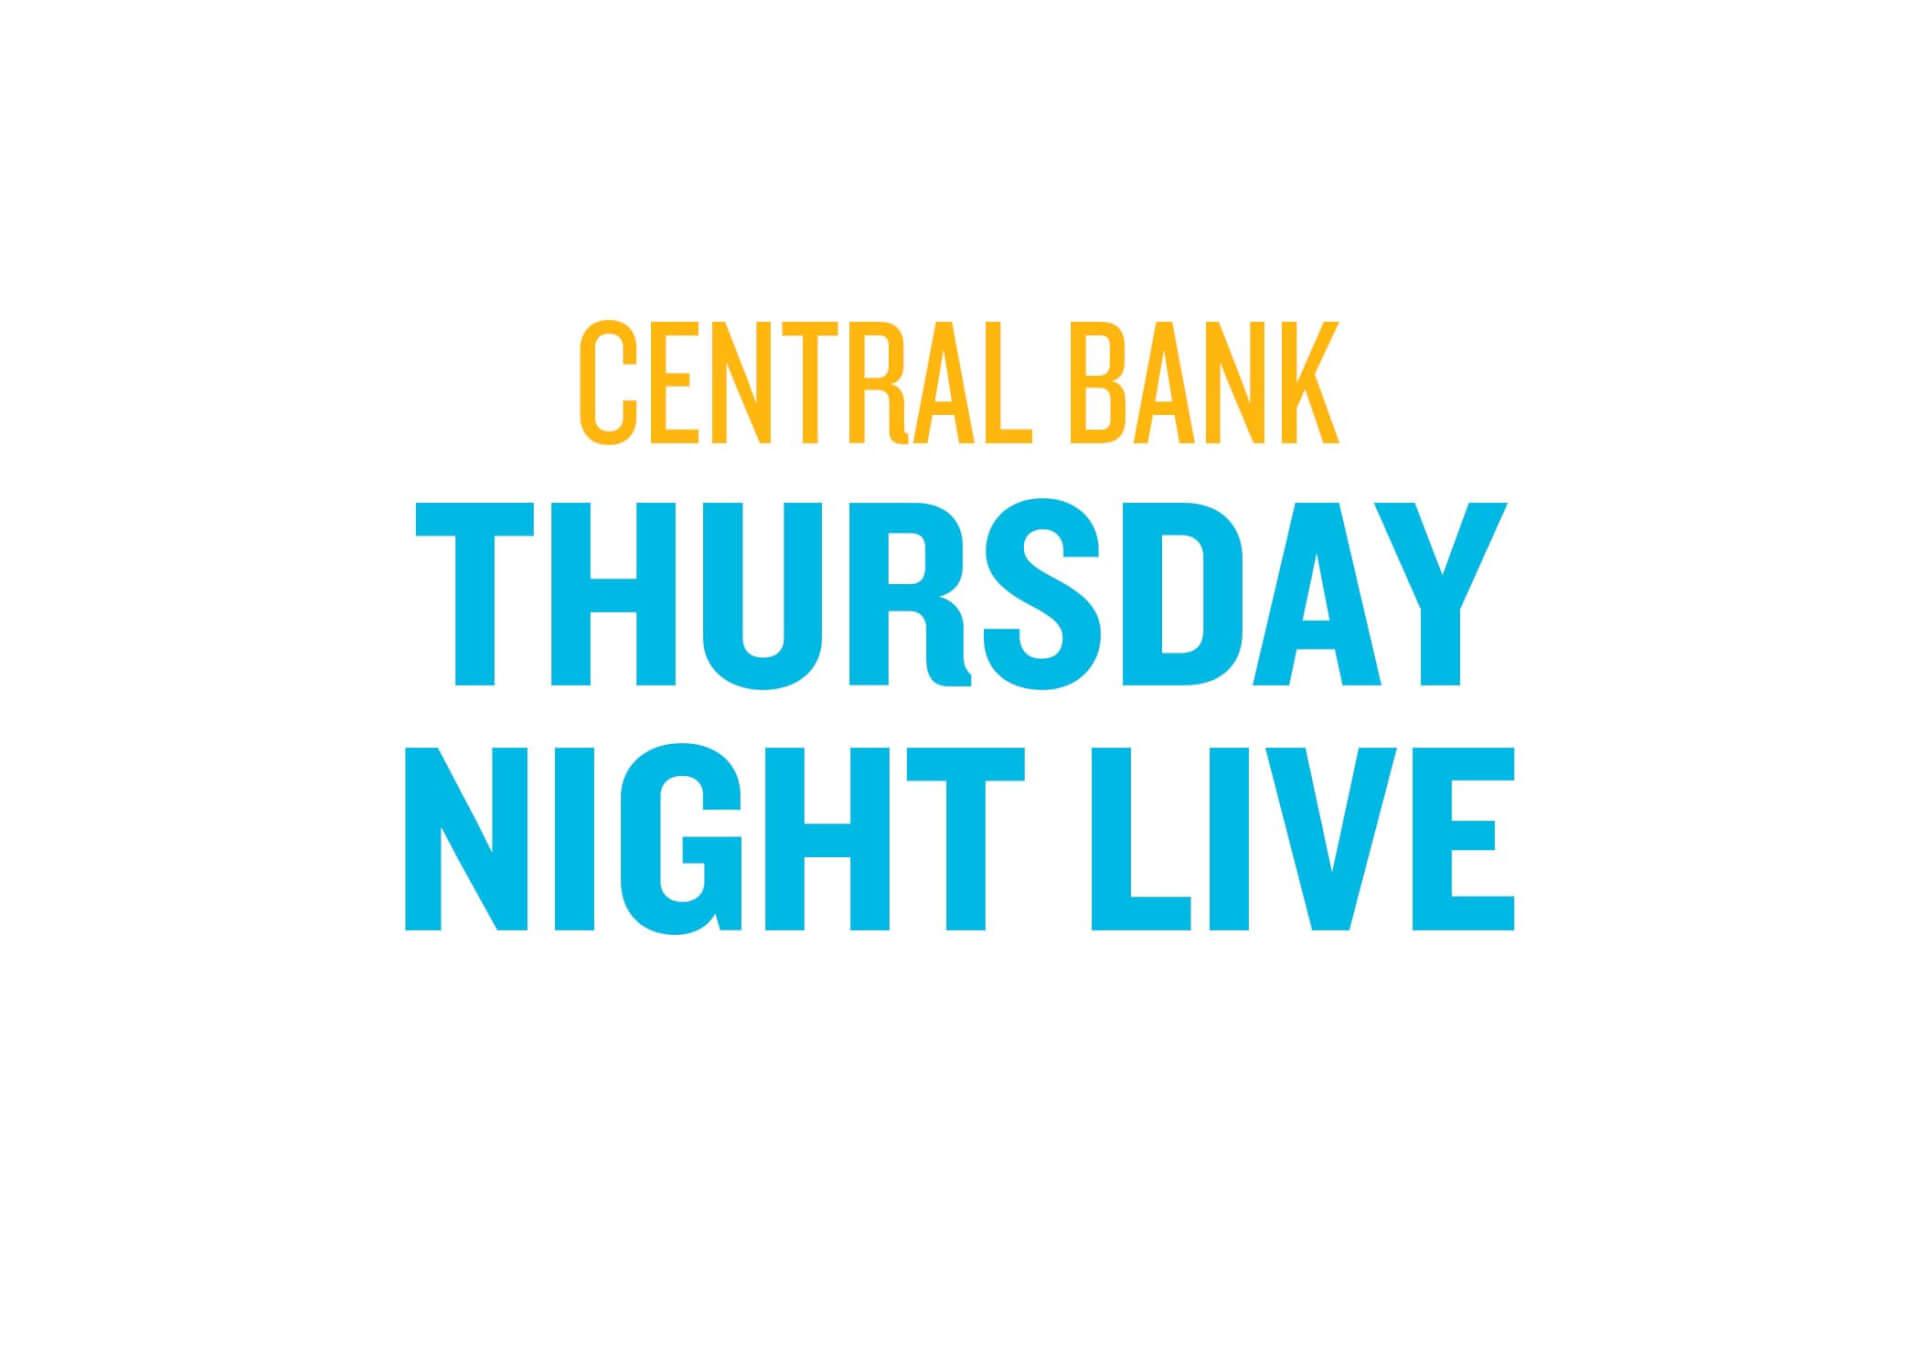 Central Bank Thursday Night Live